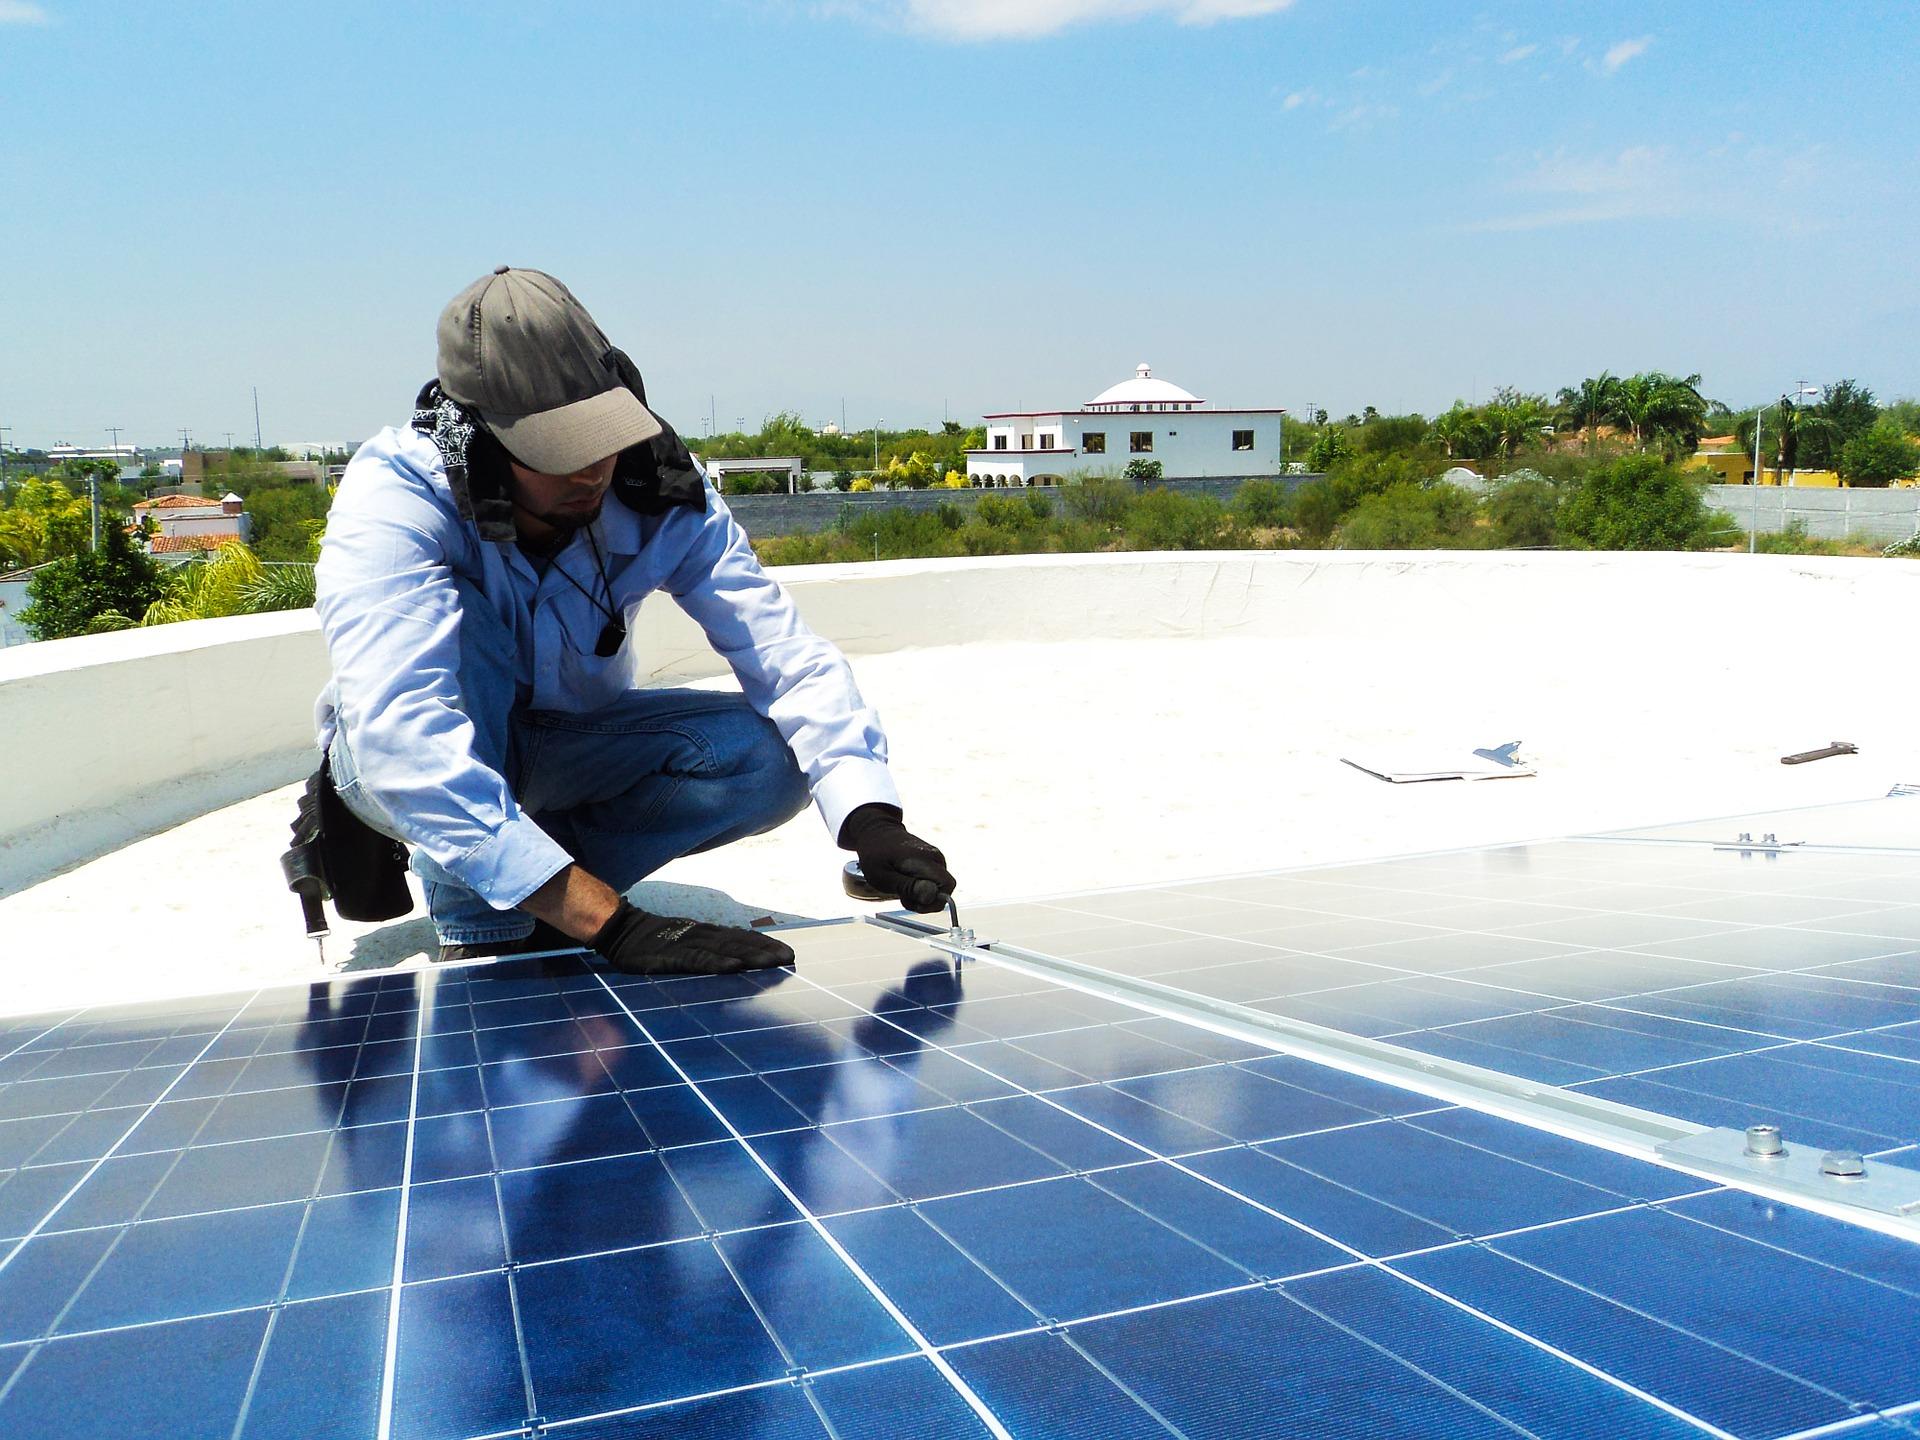 prix installation photovoltaique 100 kwc